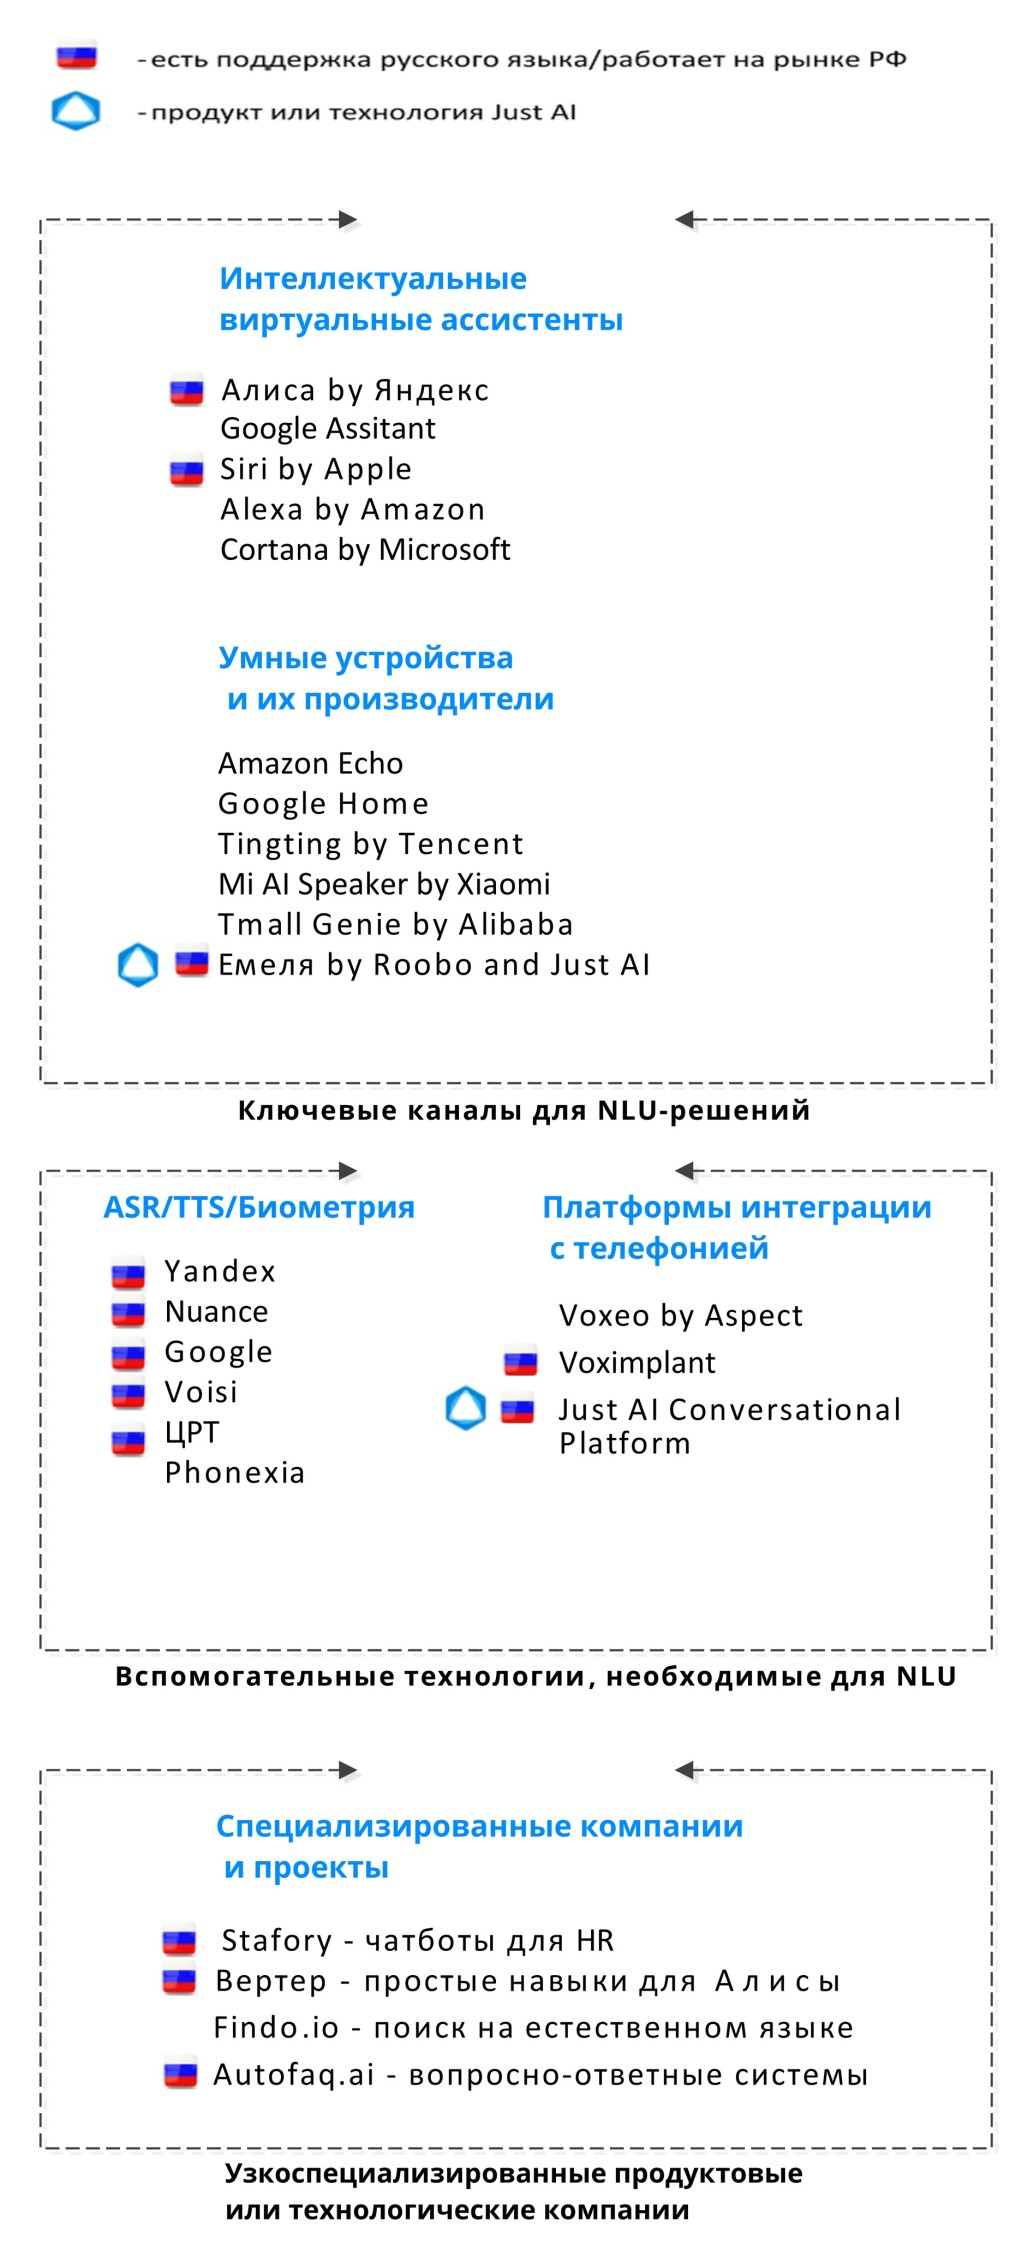 платформы и сервисе на рынке разговорного ИИ